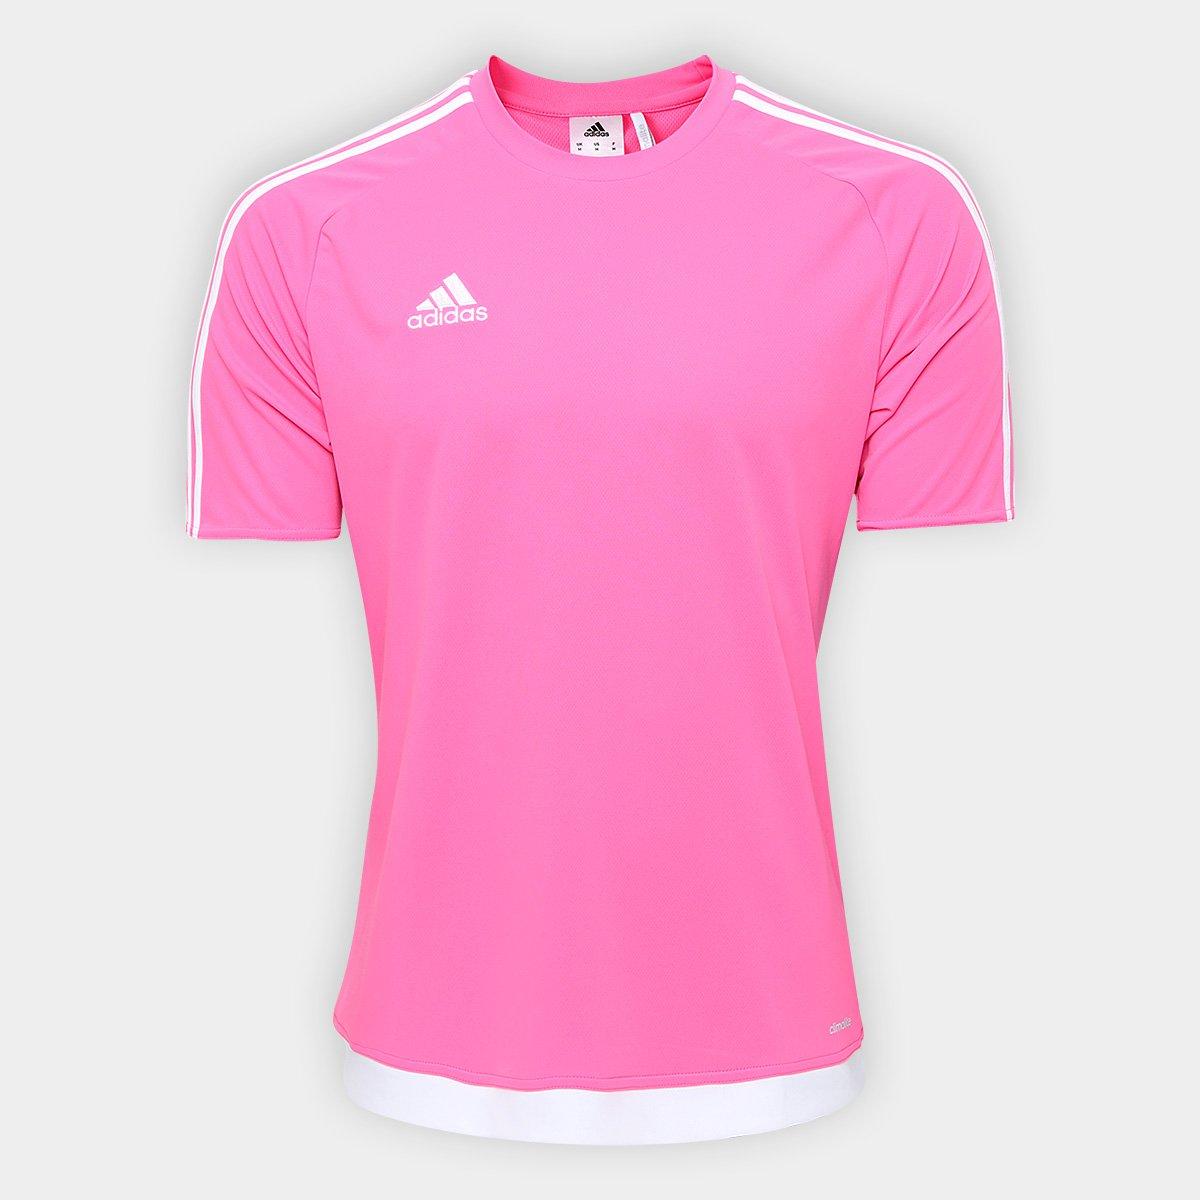 531a3e4462b Camisa Adidas Estro 15 Masculina - Rosa e Branco - Compre Agora ...